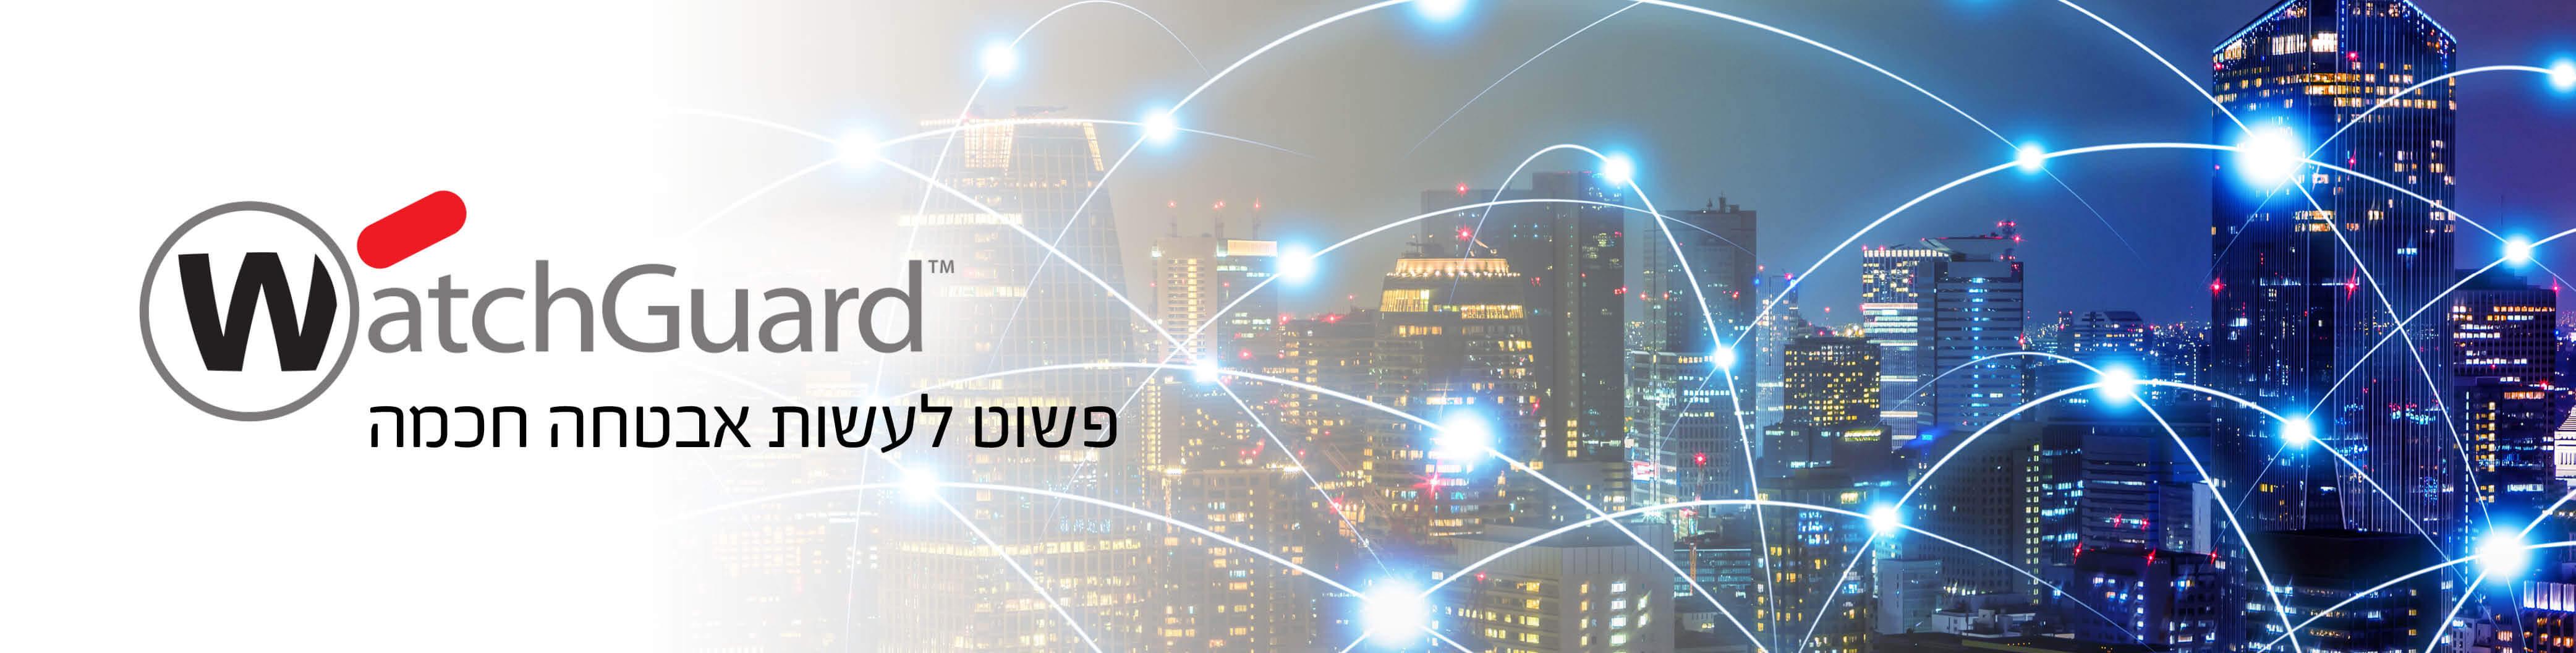 WatchGuard, watchguard, UTM, פתרונות אבטחת מידע